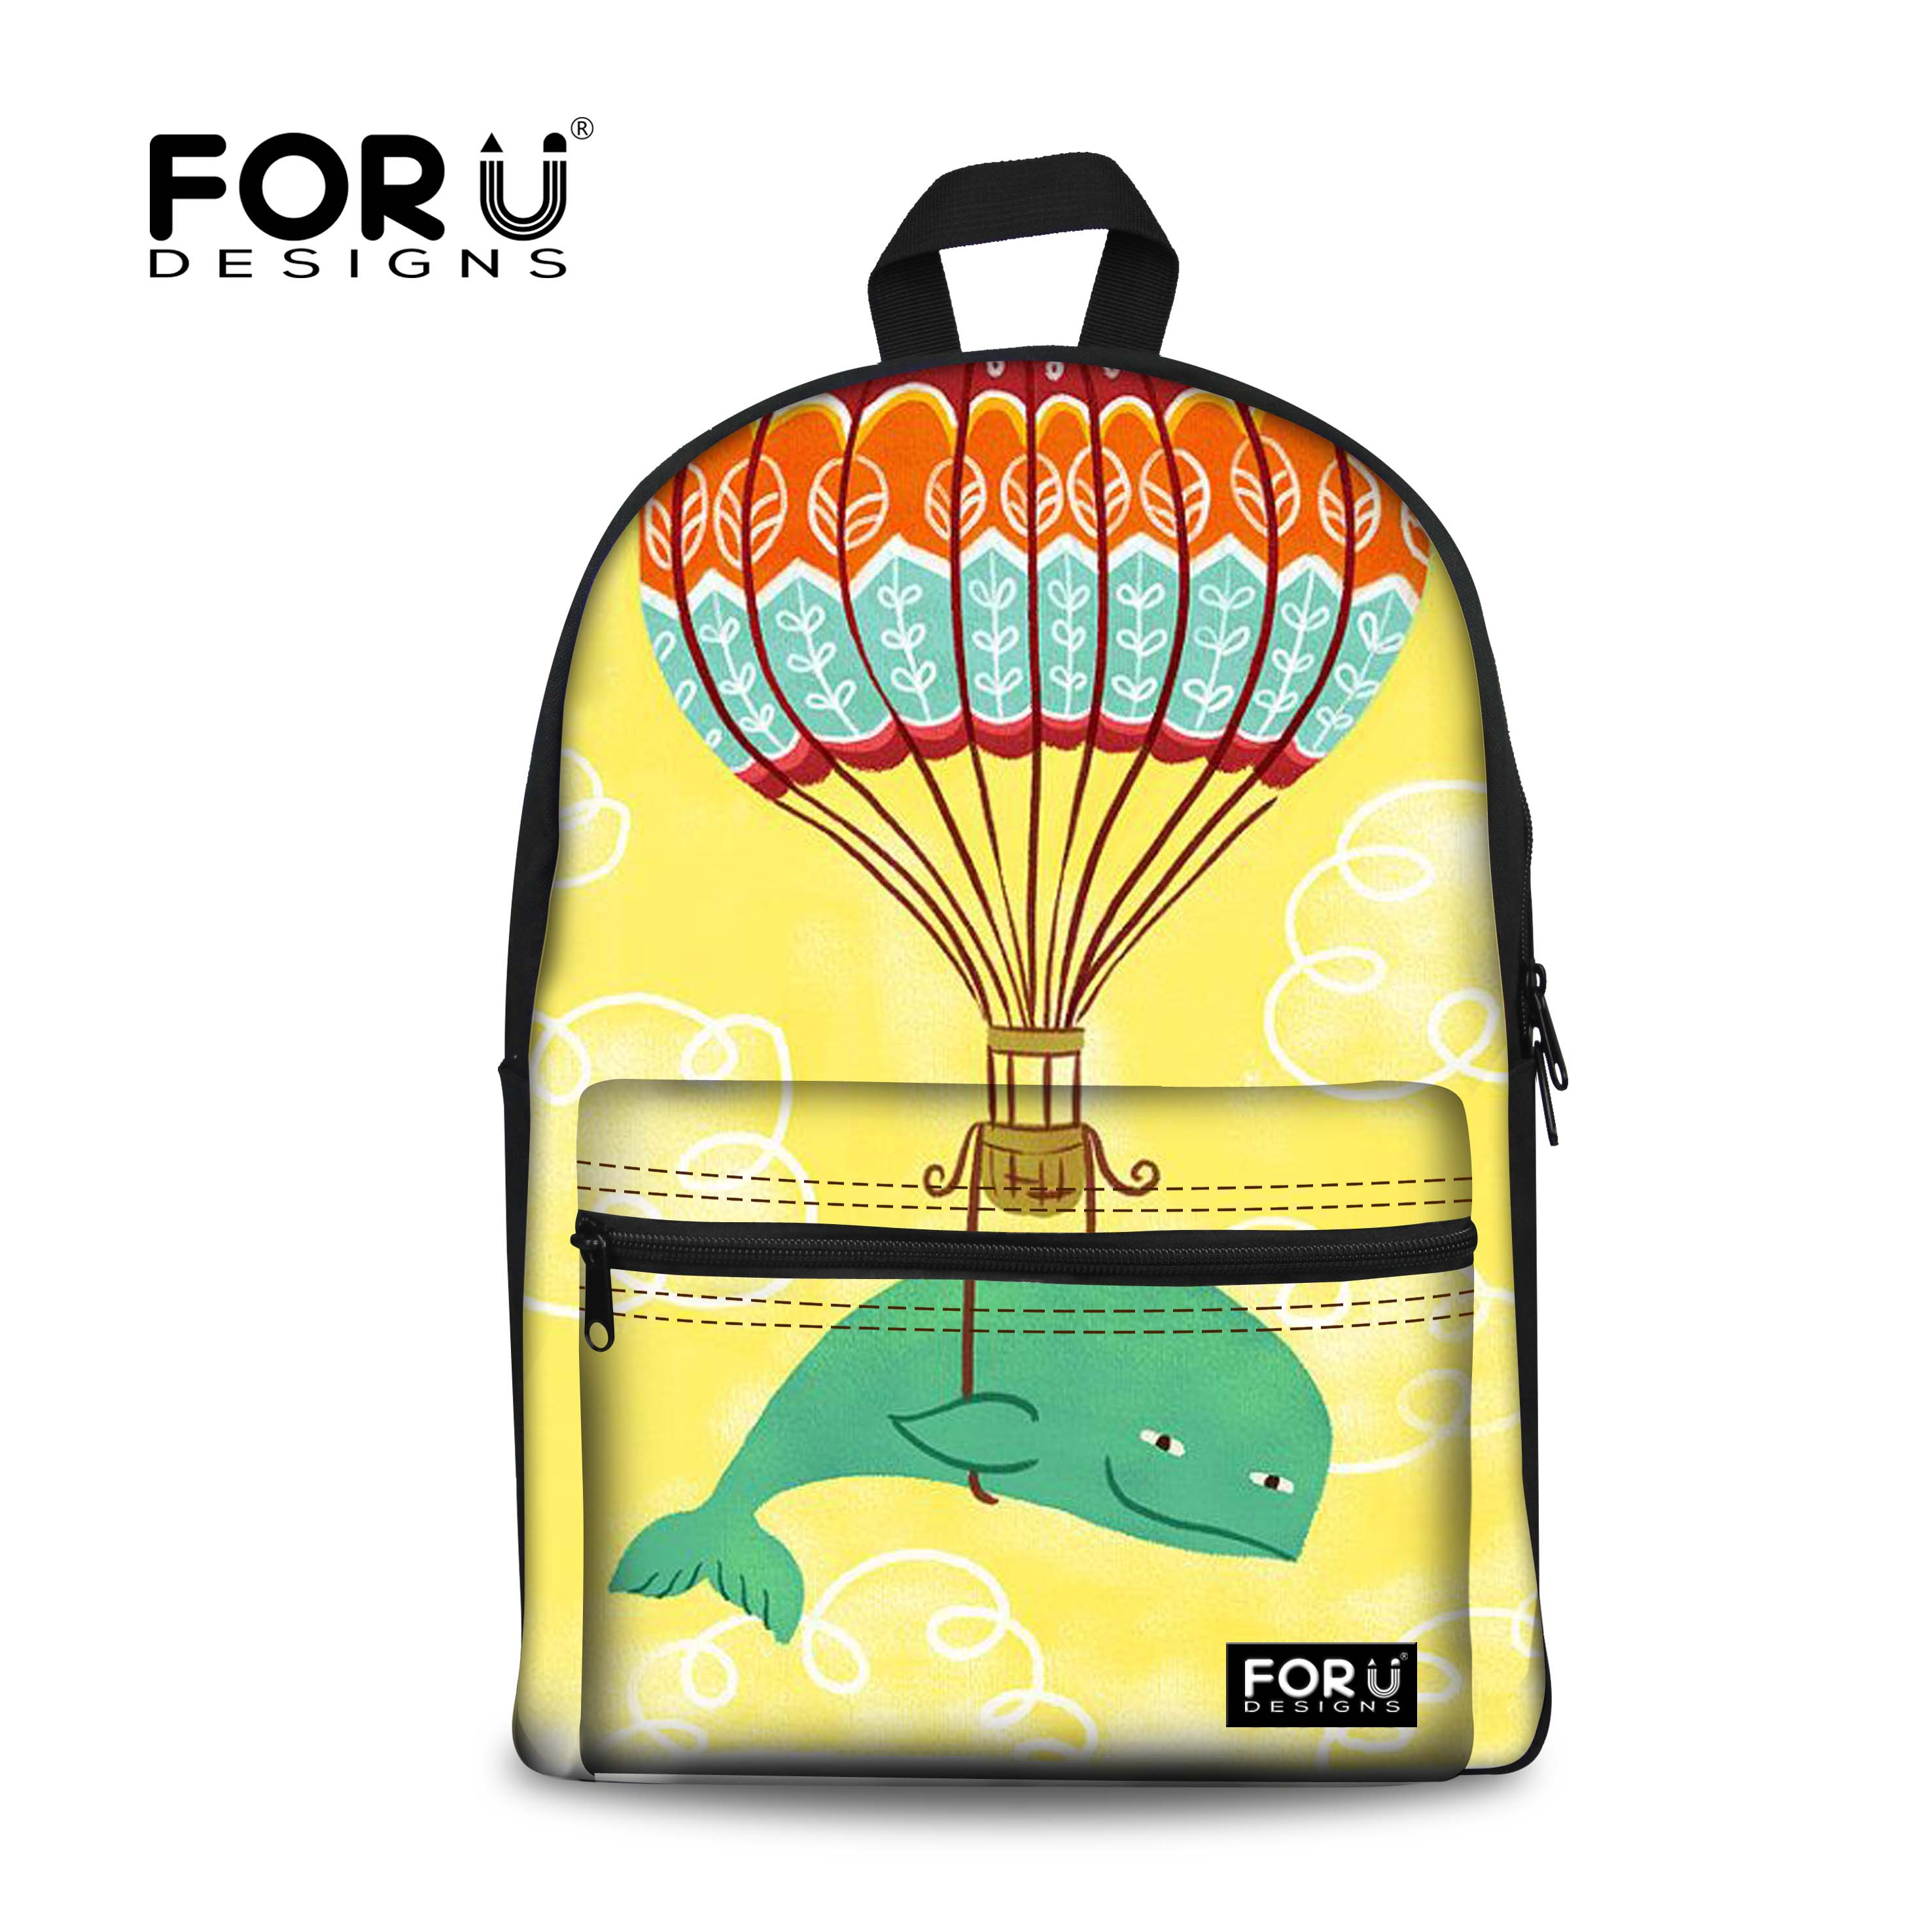 FORUDESIGNS Kawaii School Bags For Teen Girls Cartoon Fire Balloon Animal Print Backpack Whale Book Bag Rucksack For Women Lady